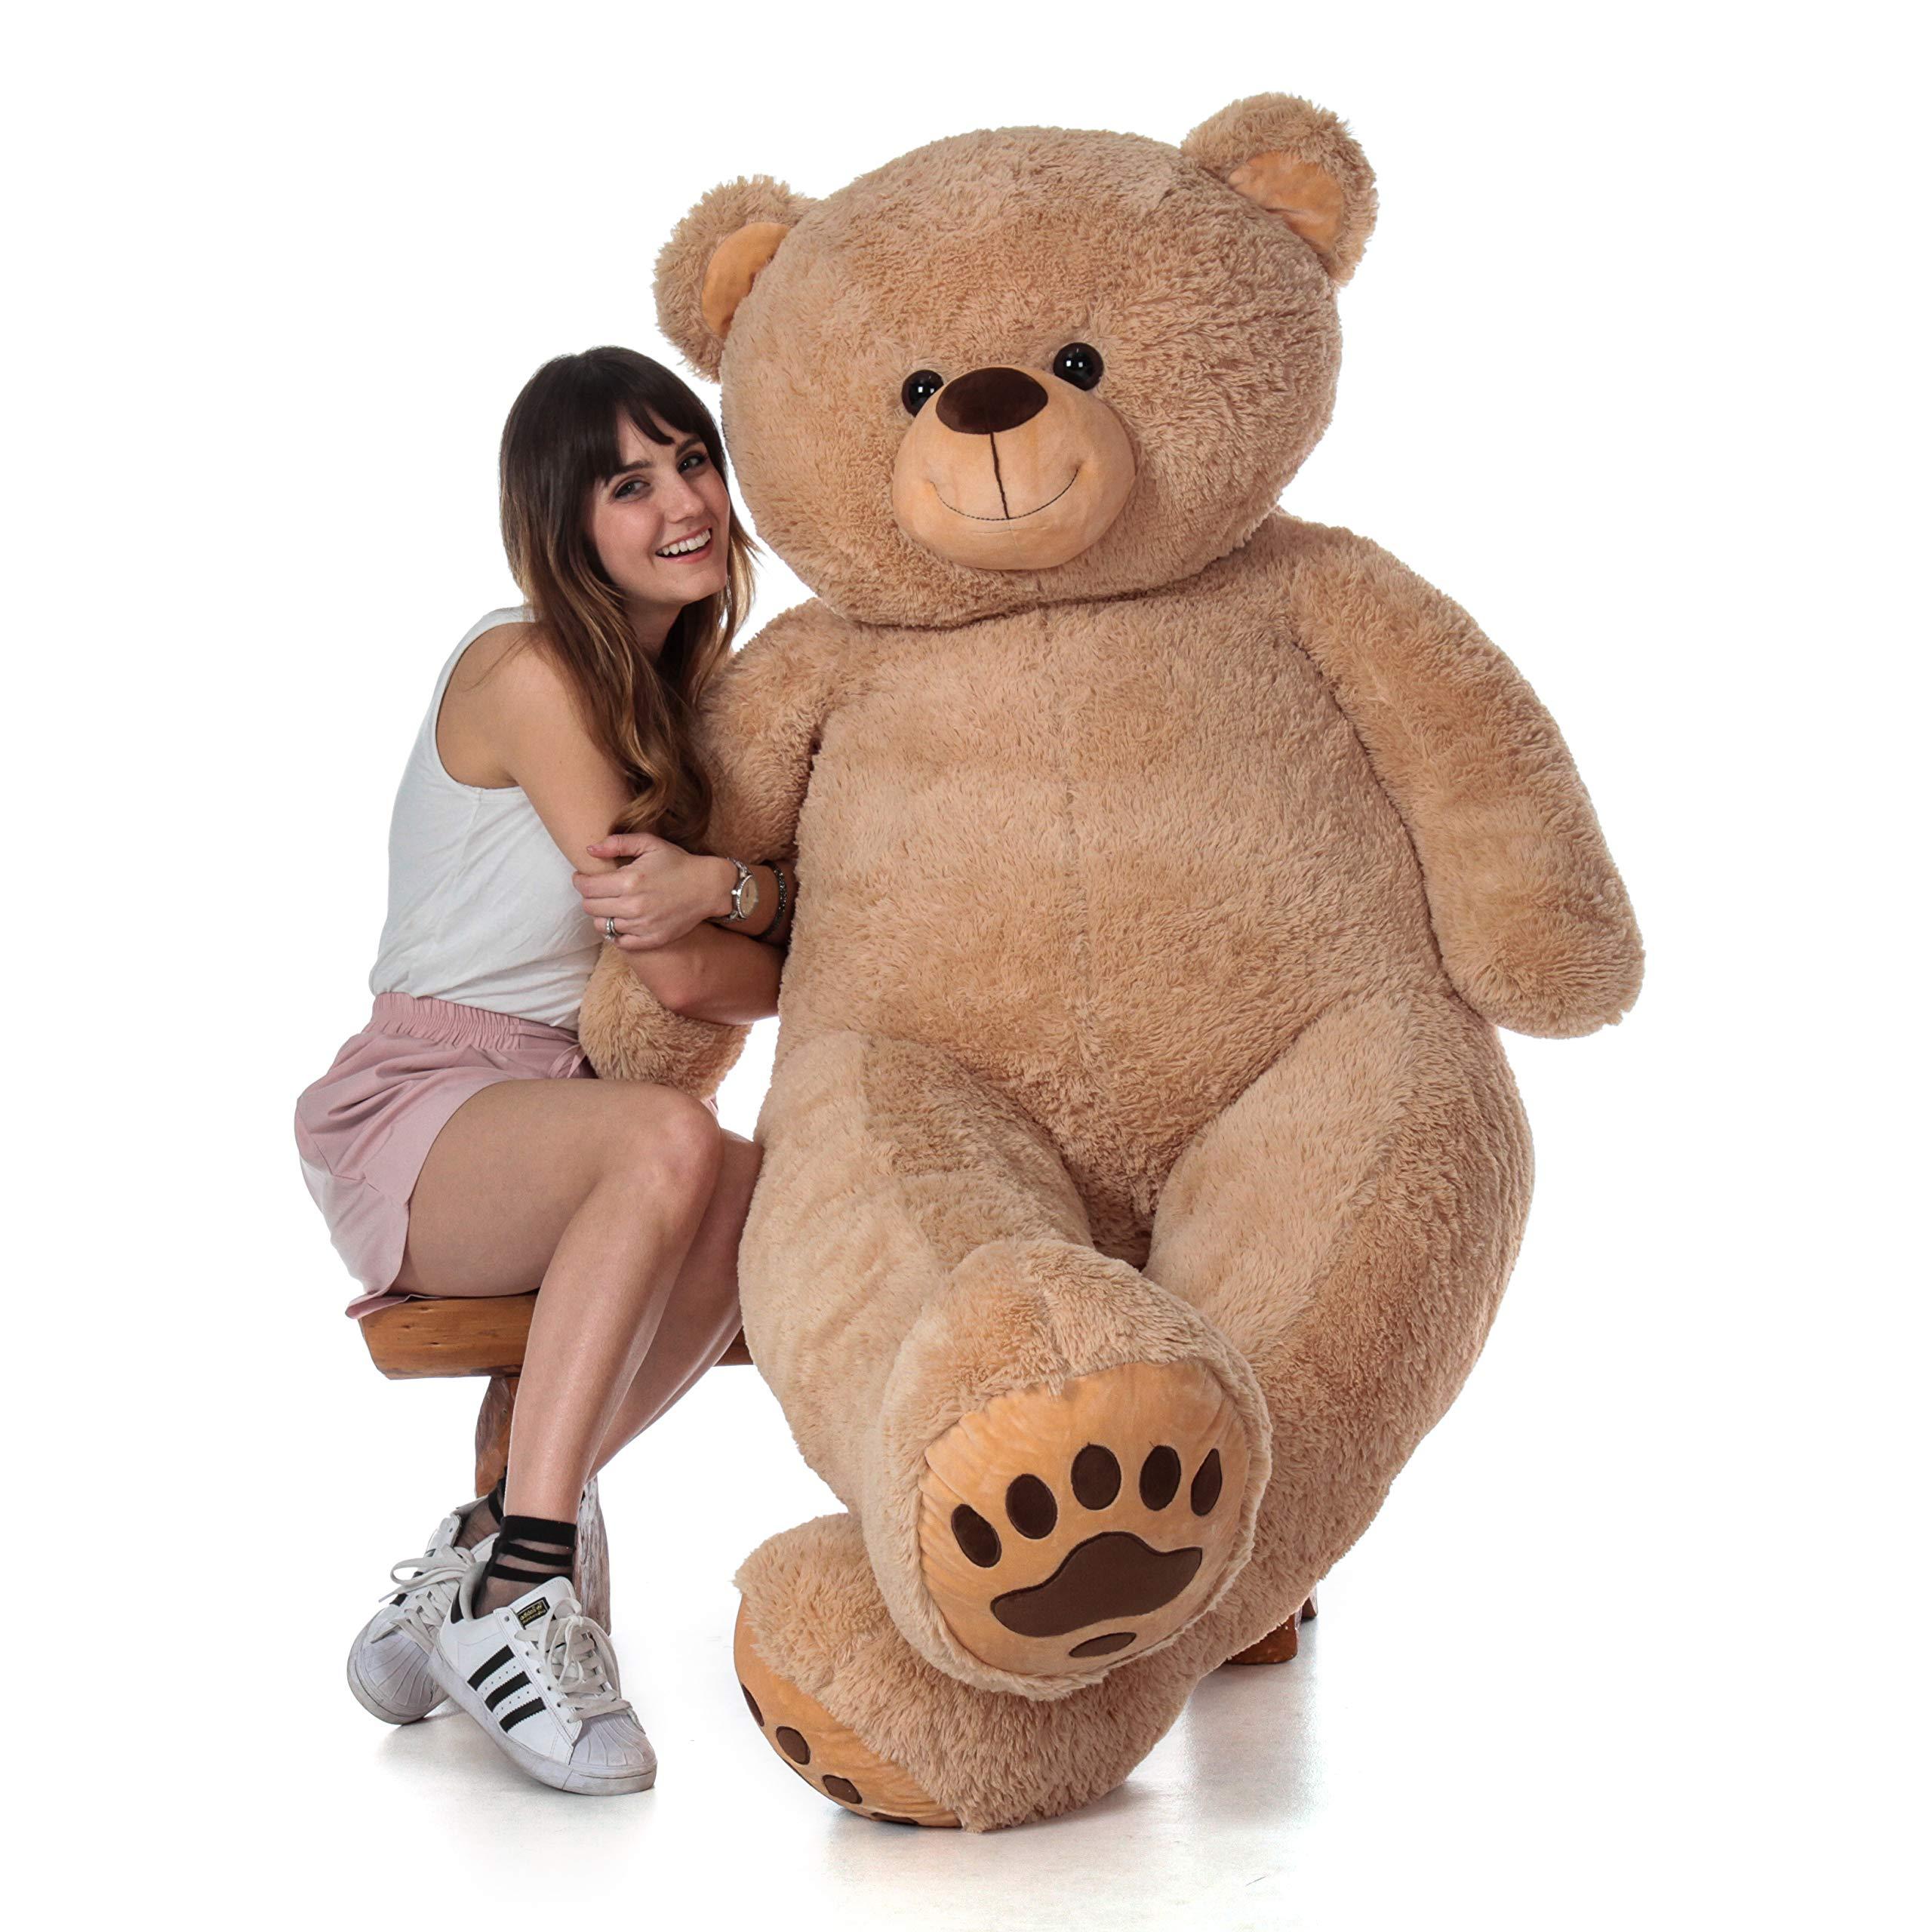 Giant Teddy Brand - 6ft Premium Quality Giant Stuffed Teddy Bear Stuffed Animal